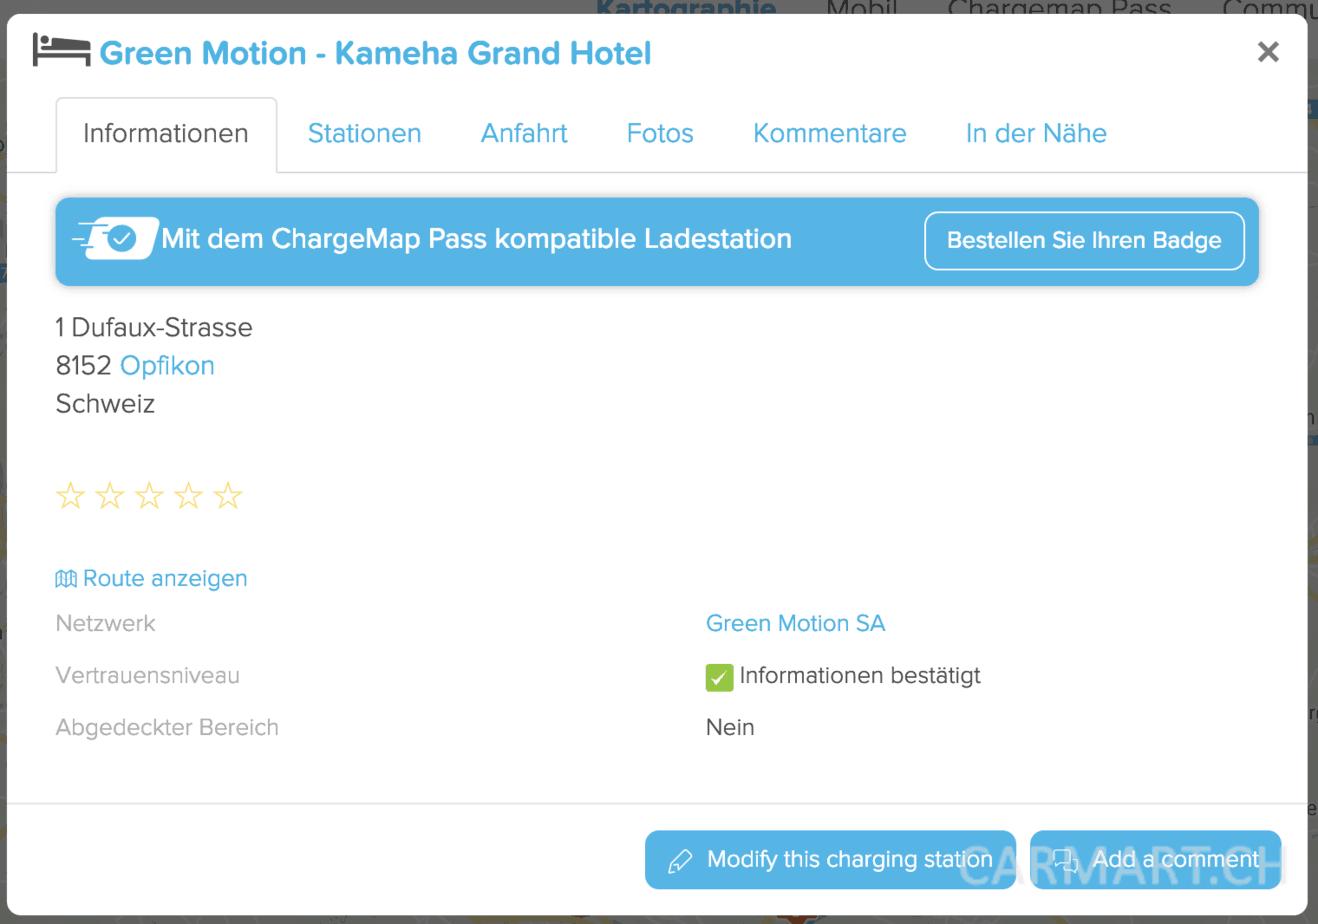 chargemap.com Informationstafel